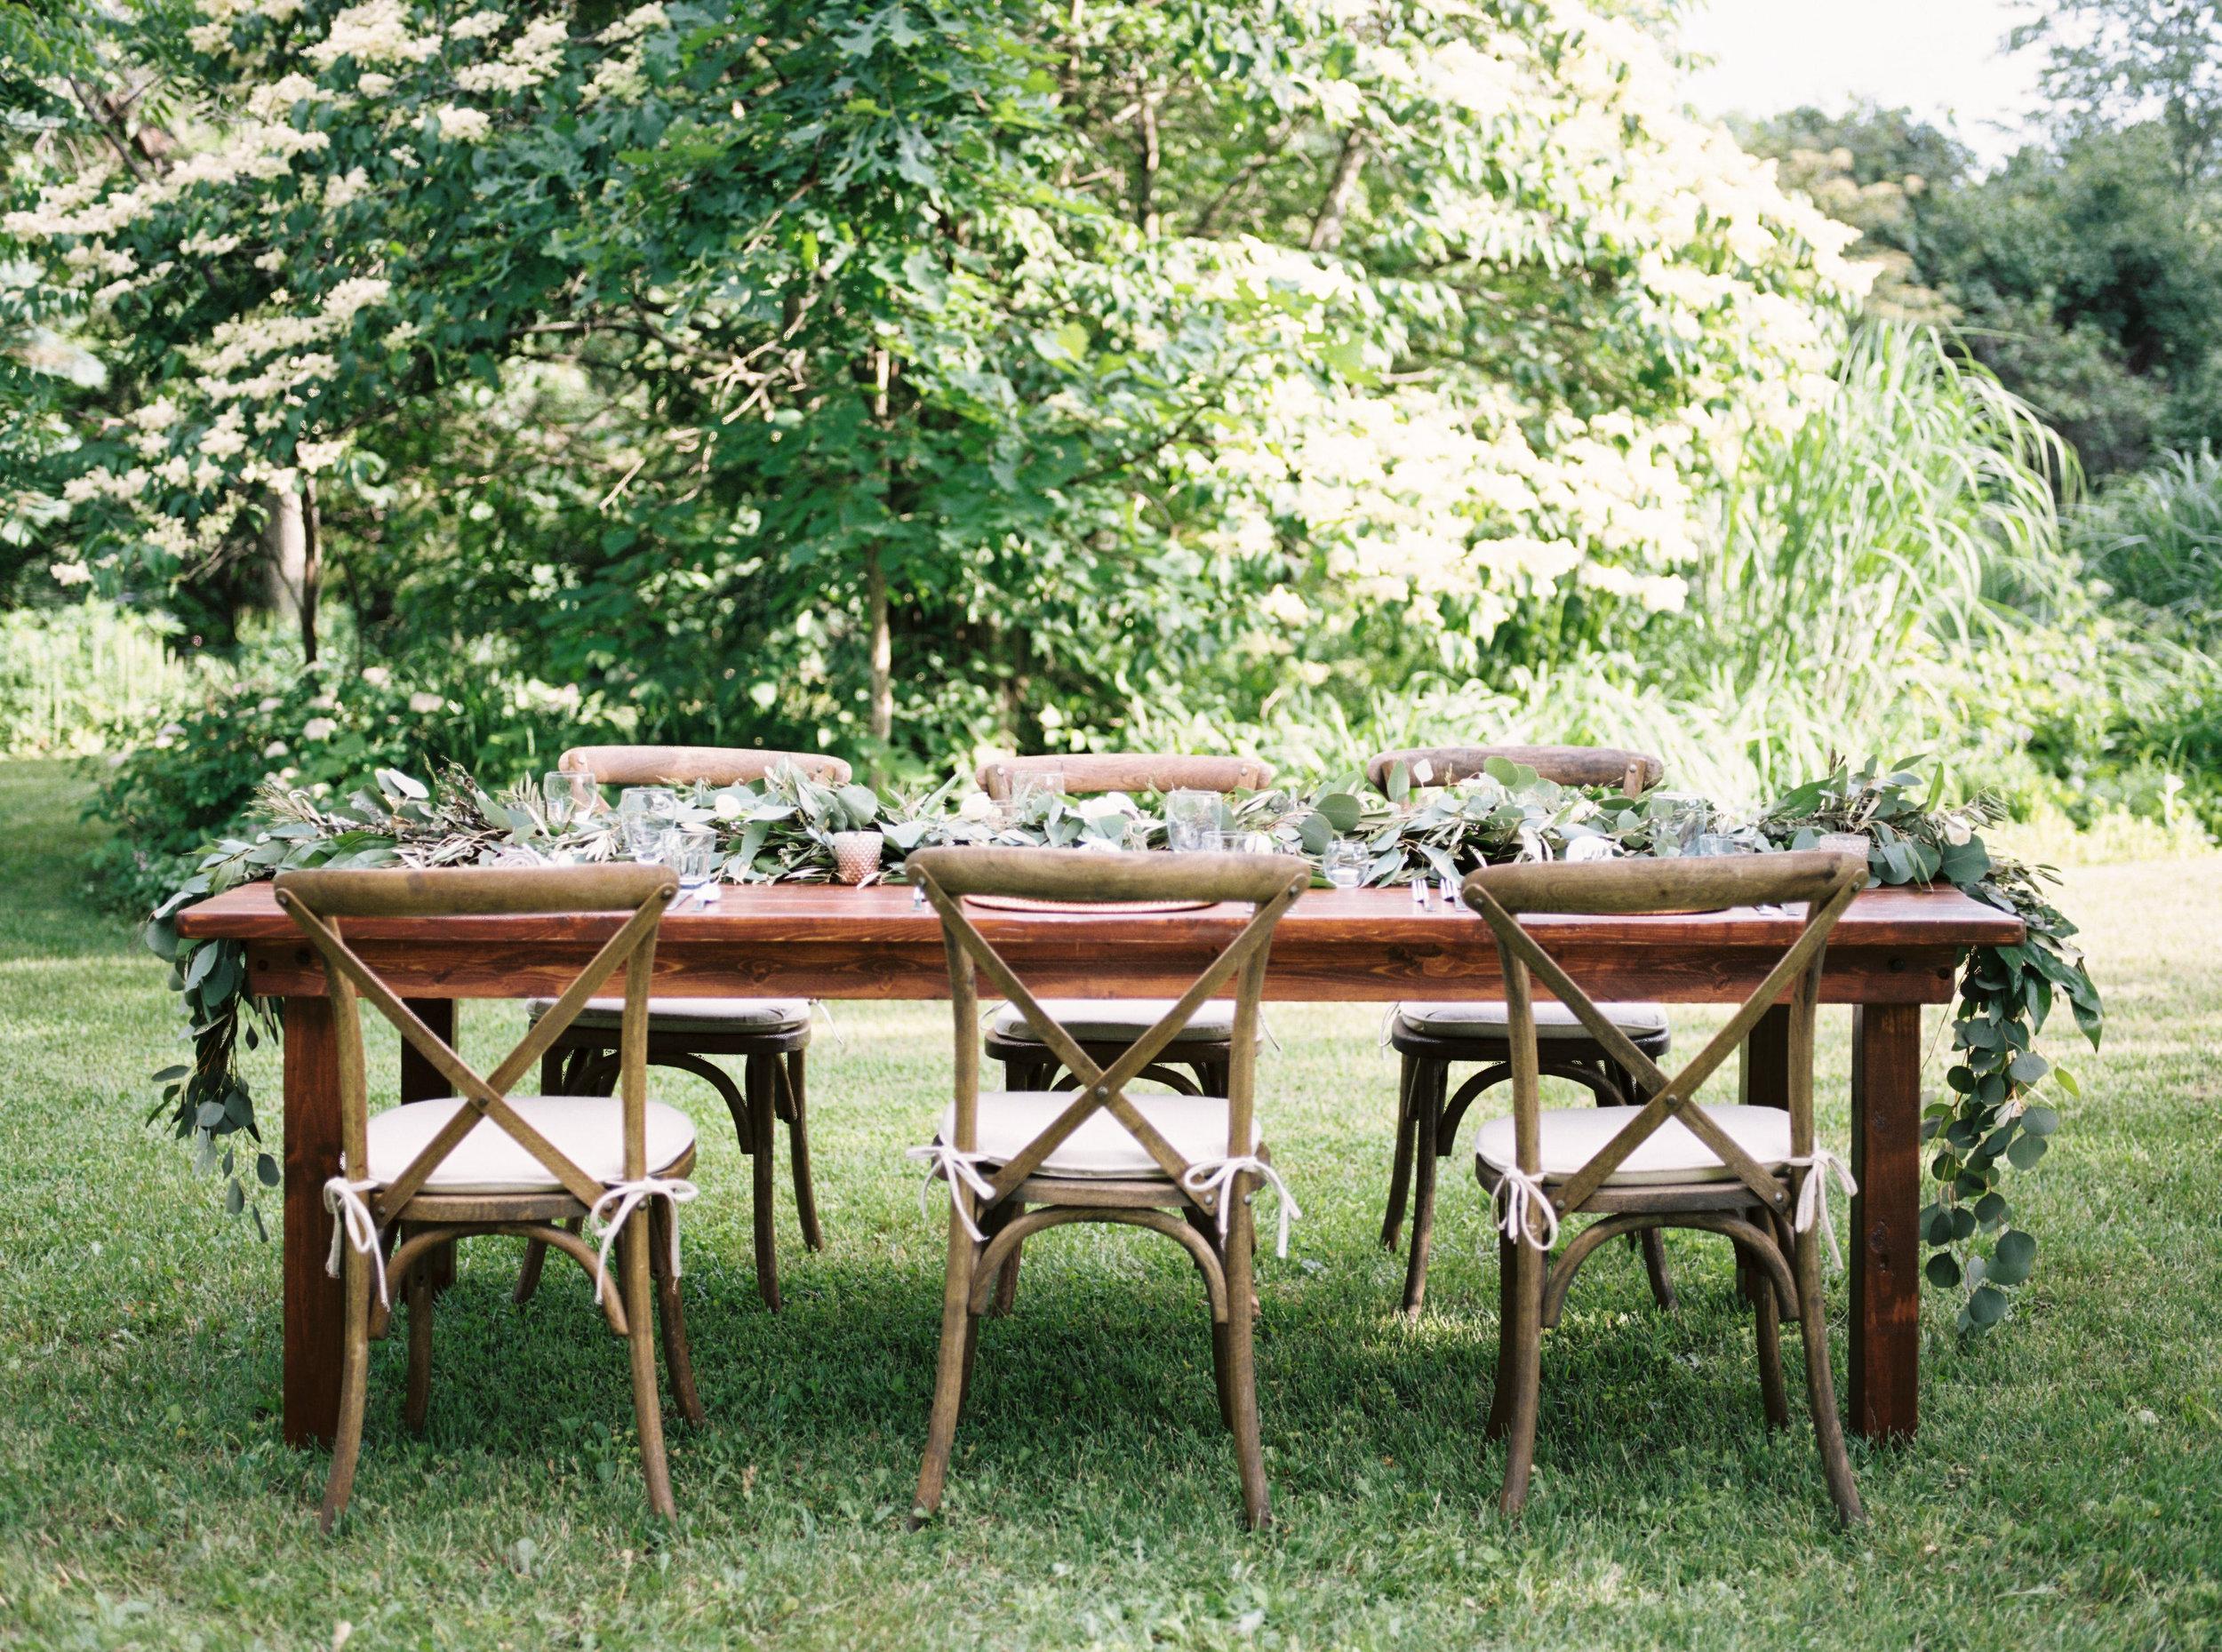 greenhouse-wedding-inspiration-by-laurelyn-savannah-photography-142.jpg